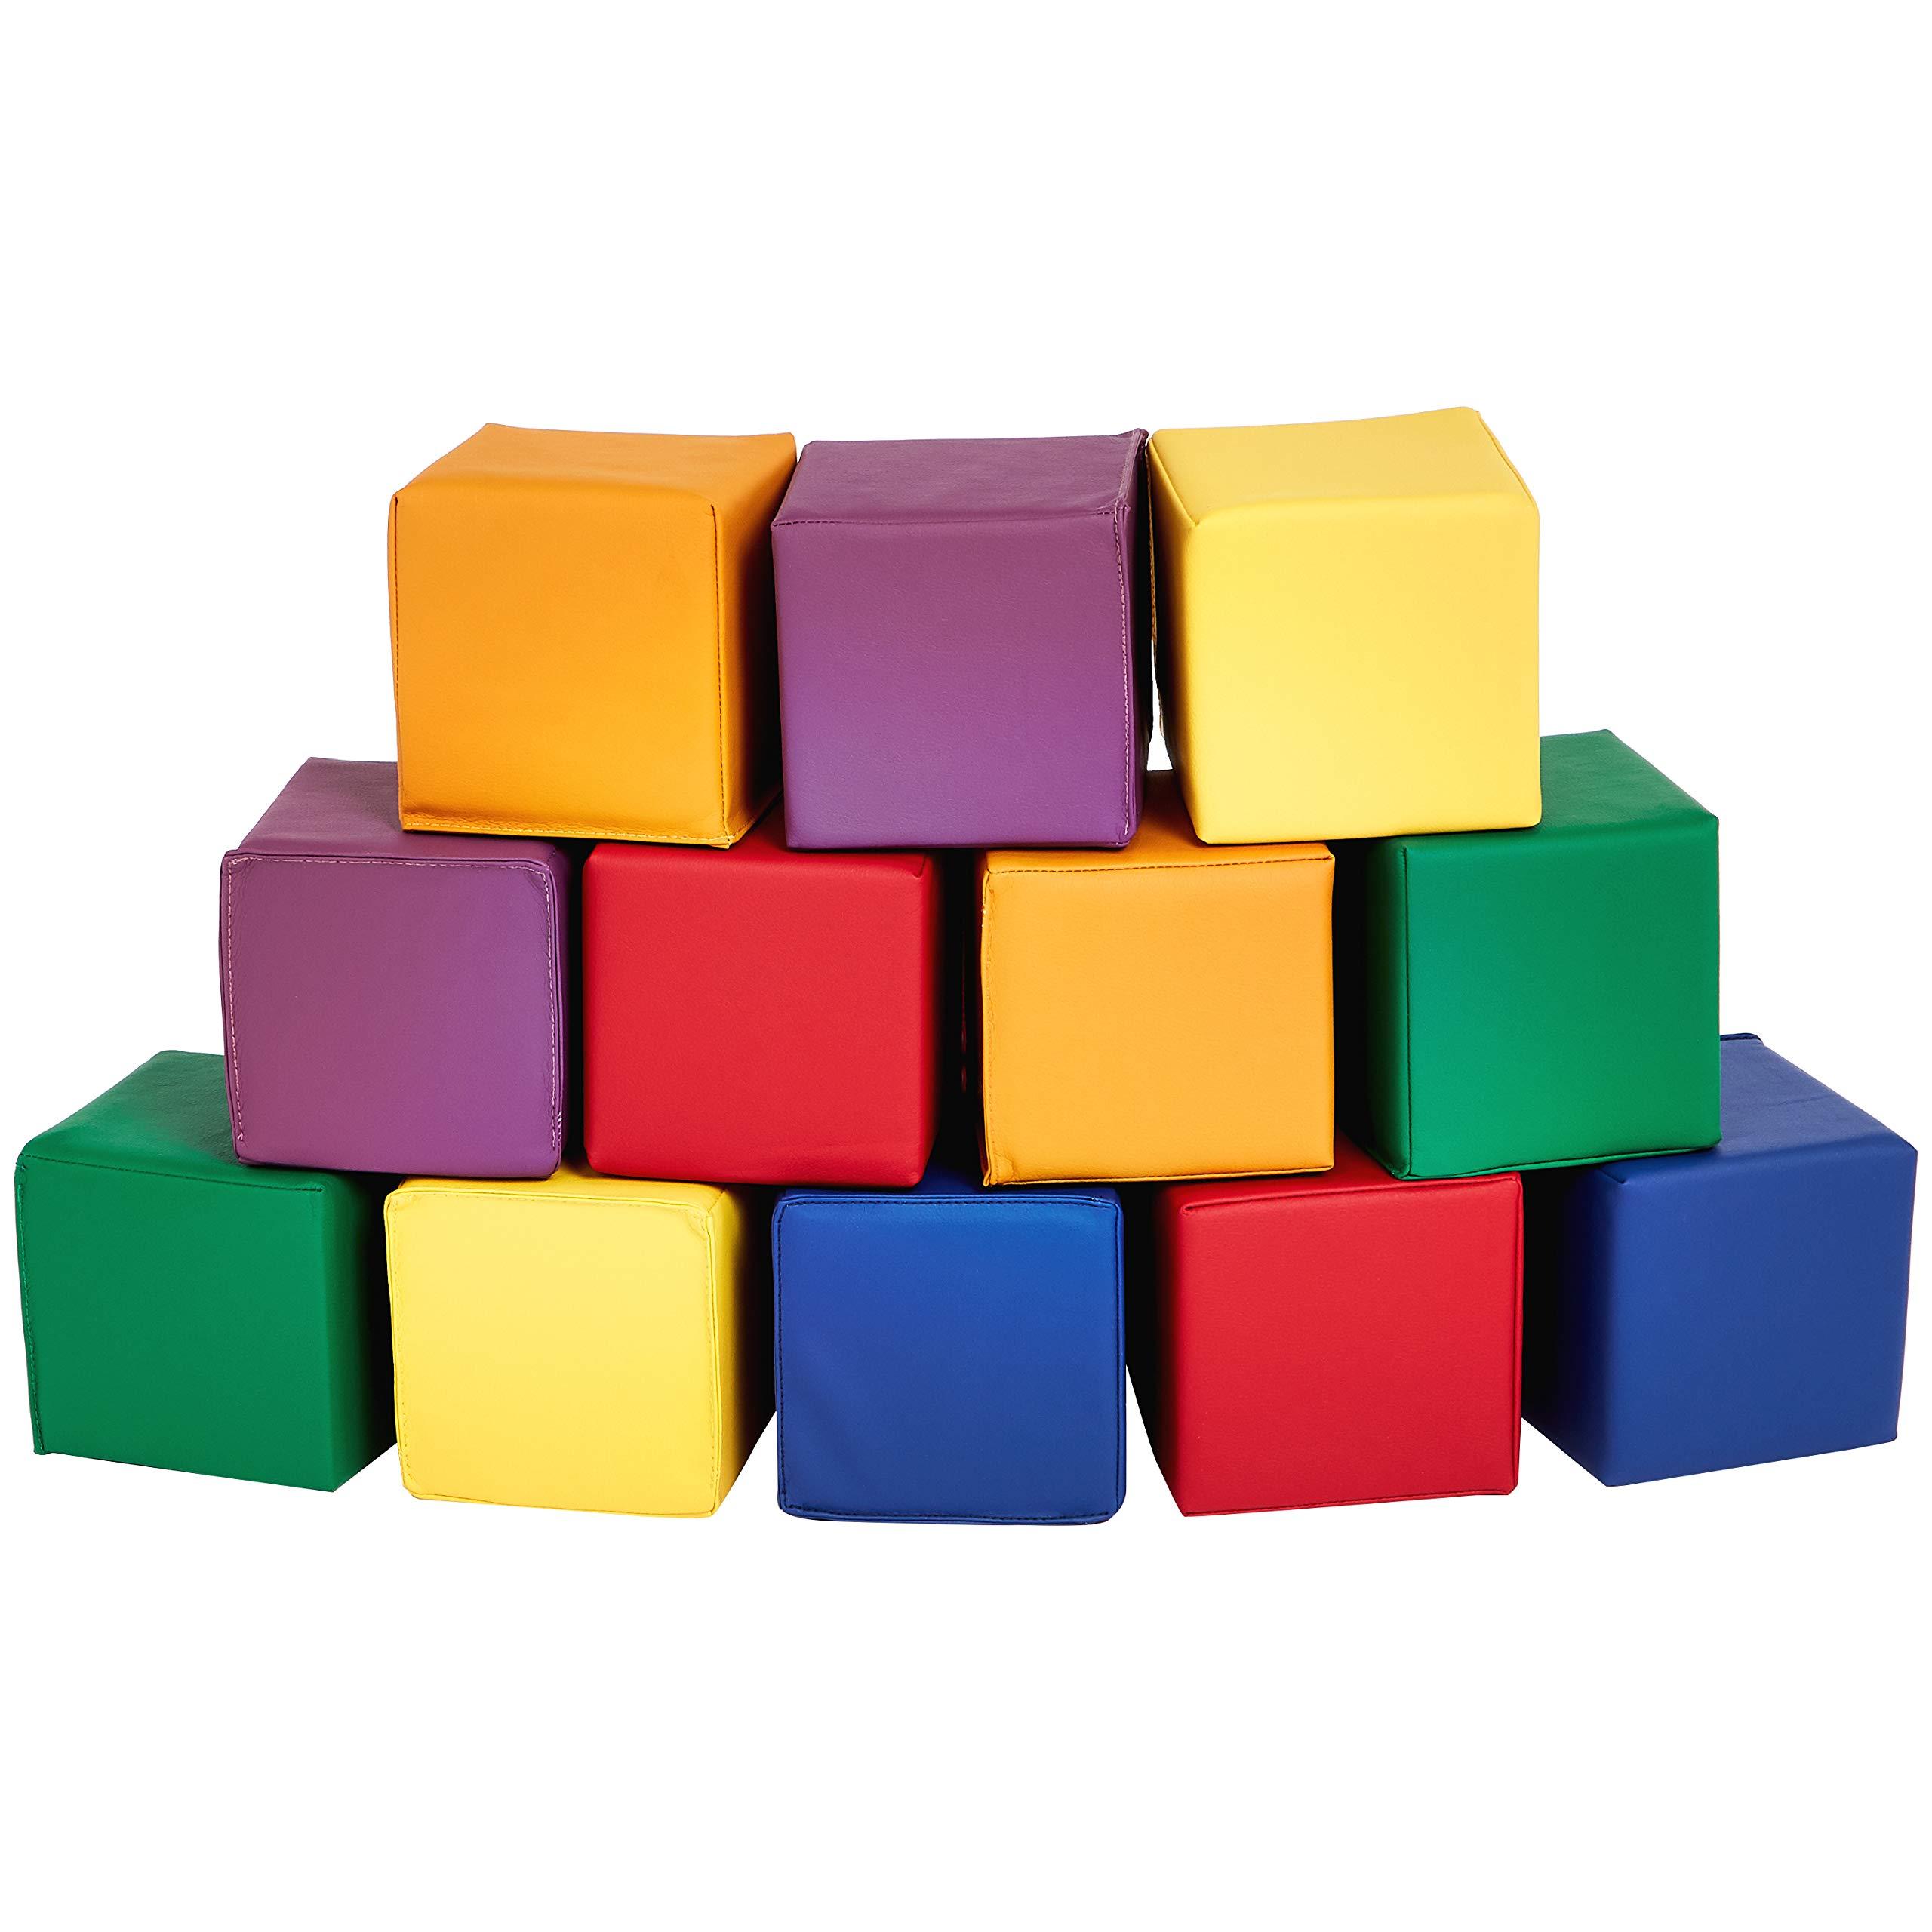 Amazon Basics Soft Play Blocks, Small Set, 12-Piece